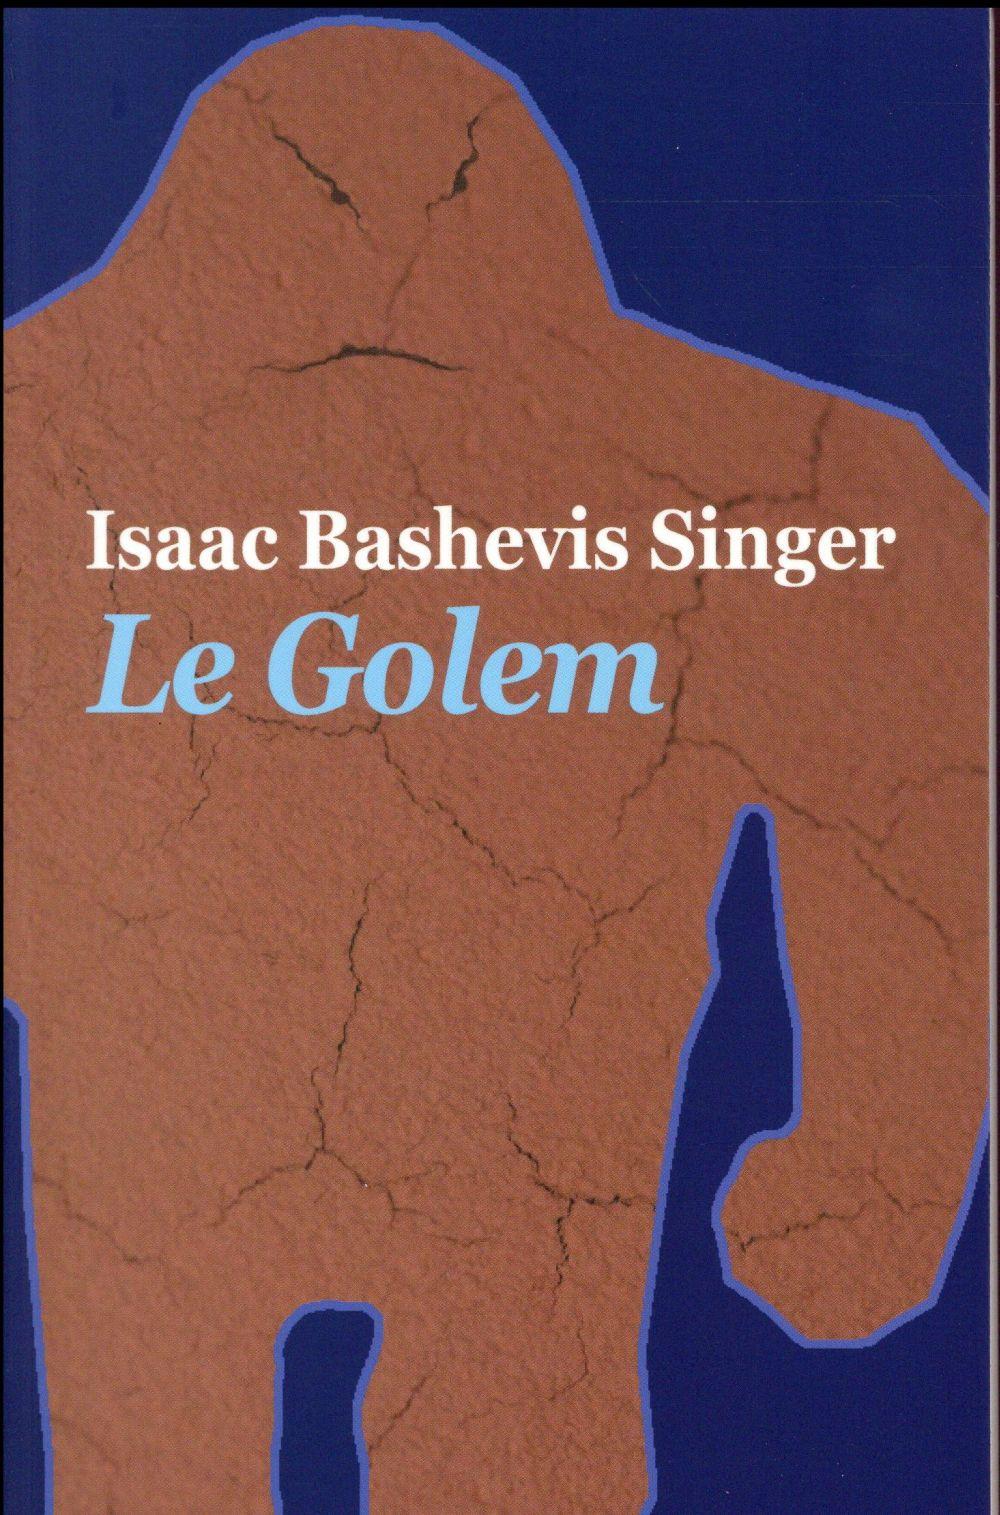 Le golem (poche)